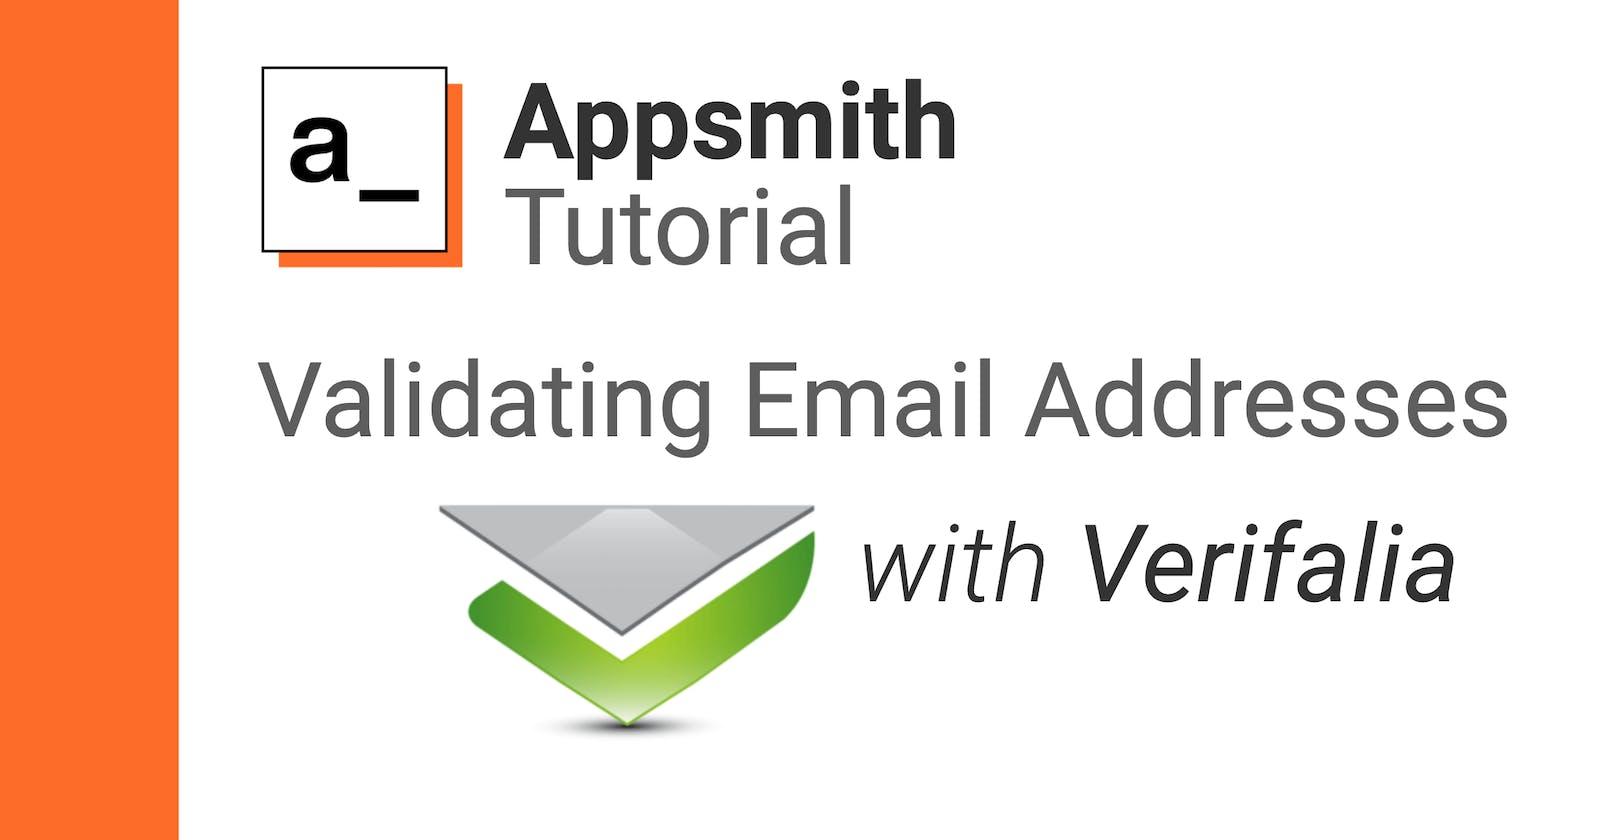 Validating Emails with Appsmith & the Verifalia API